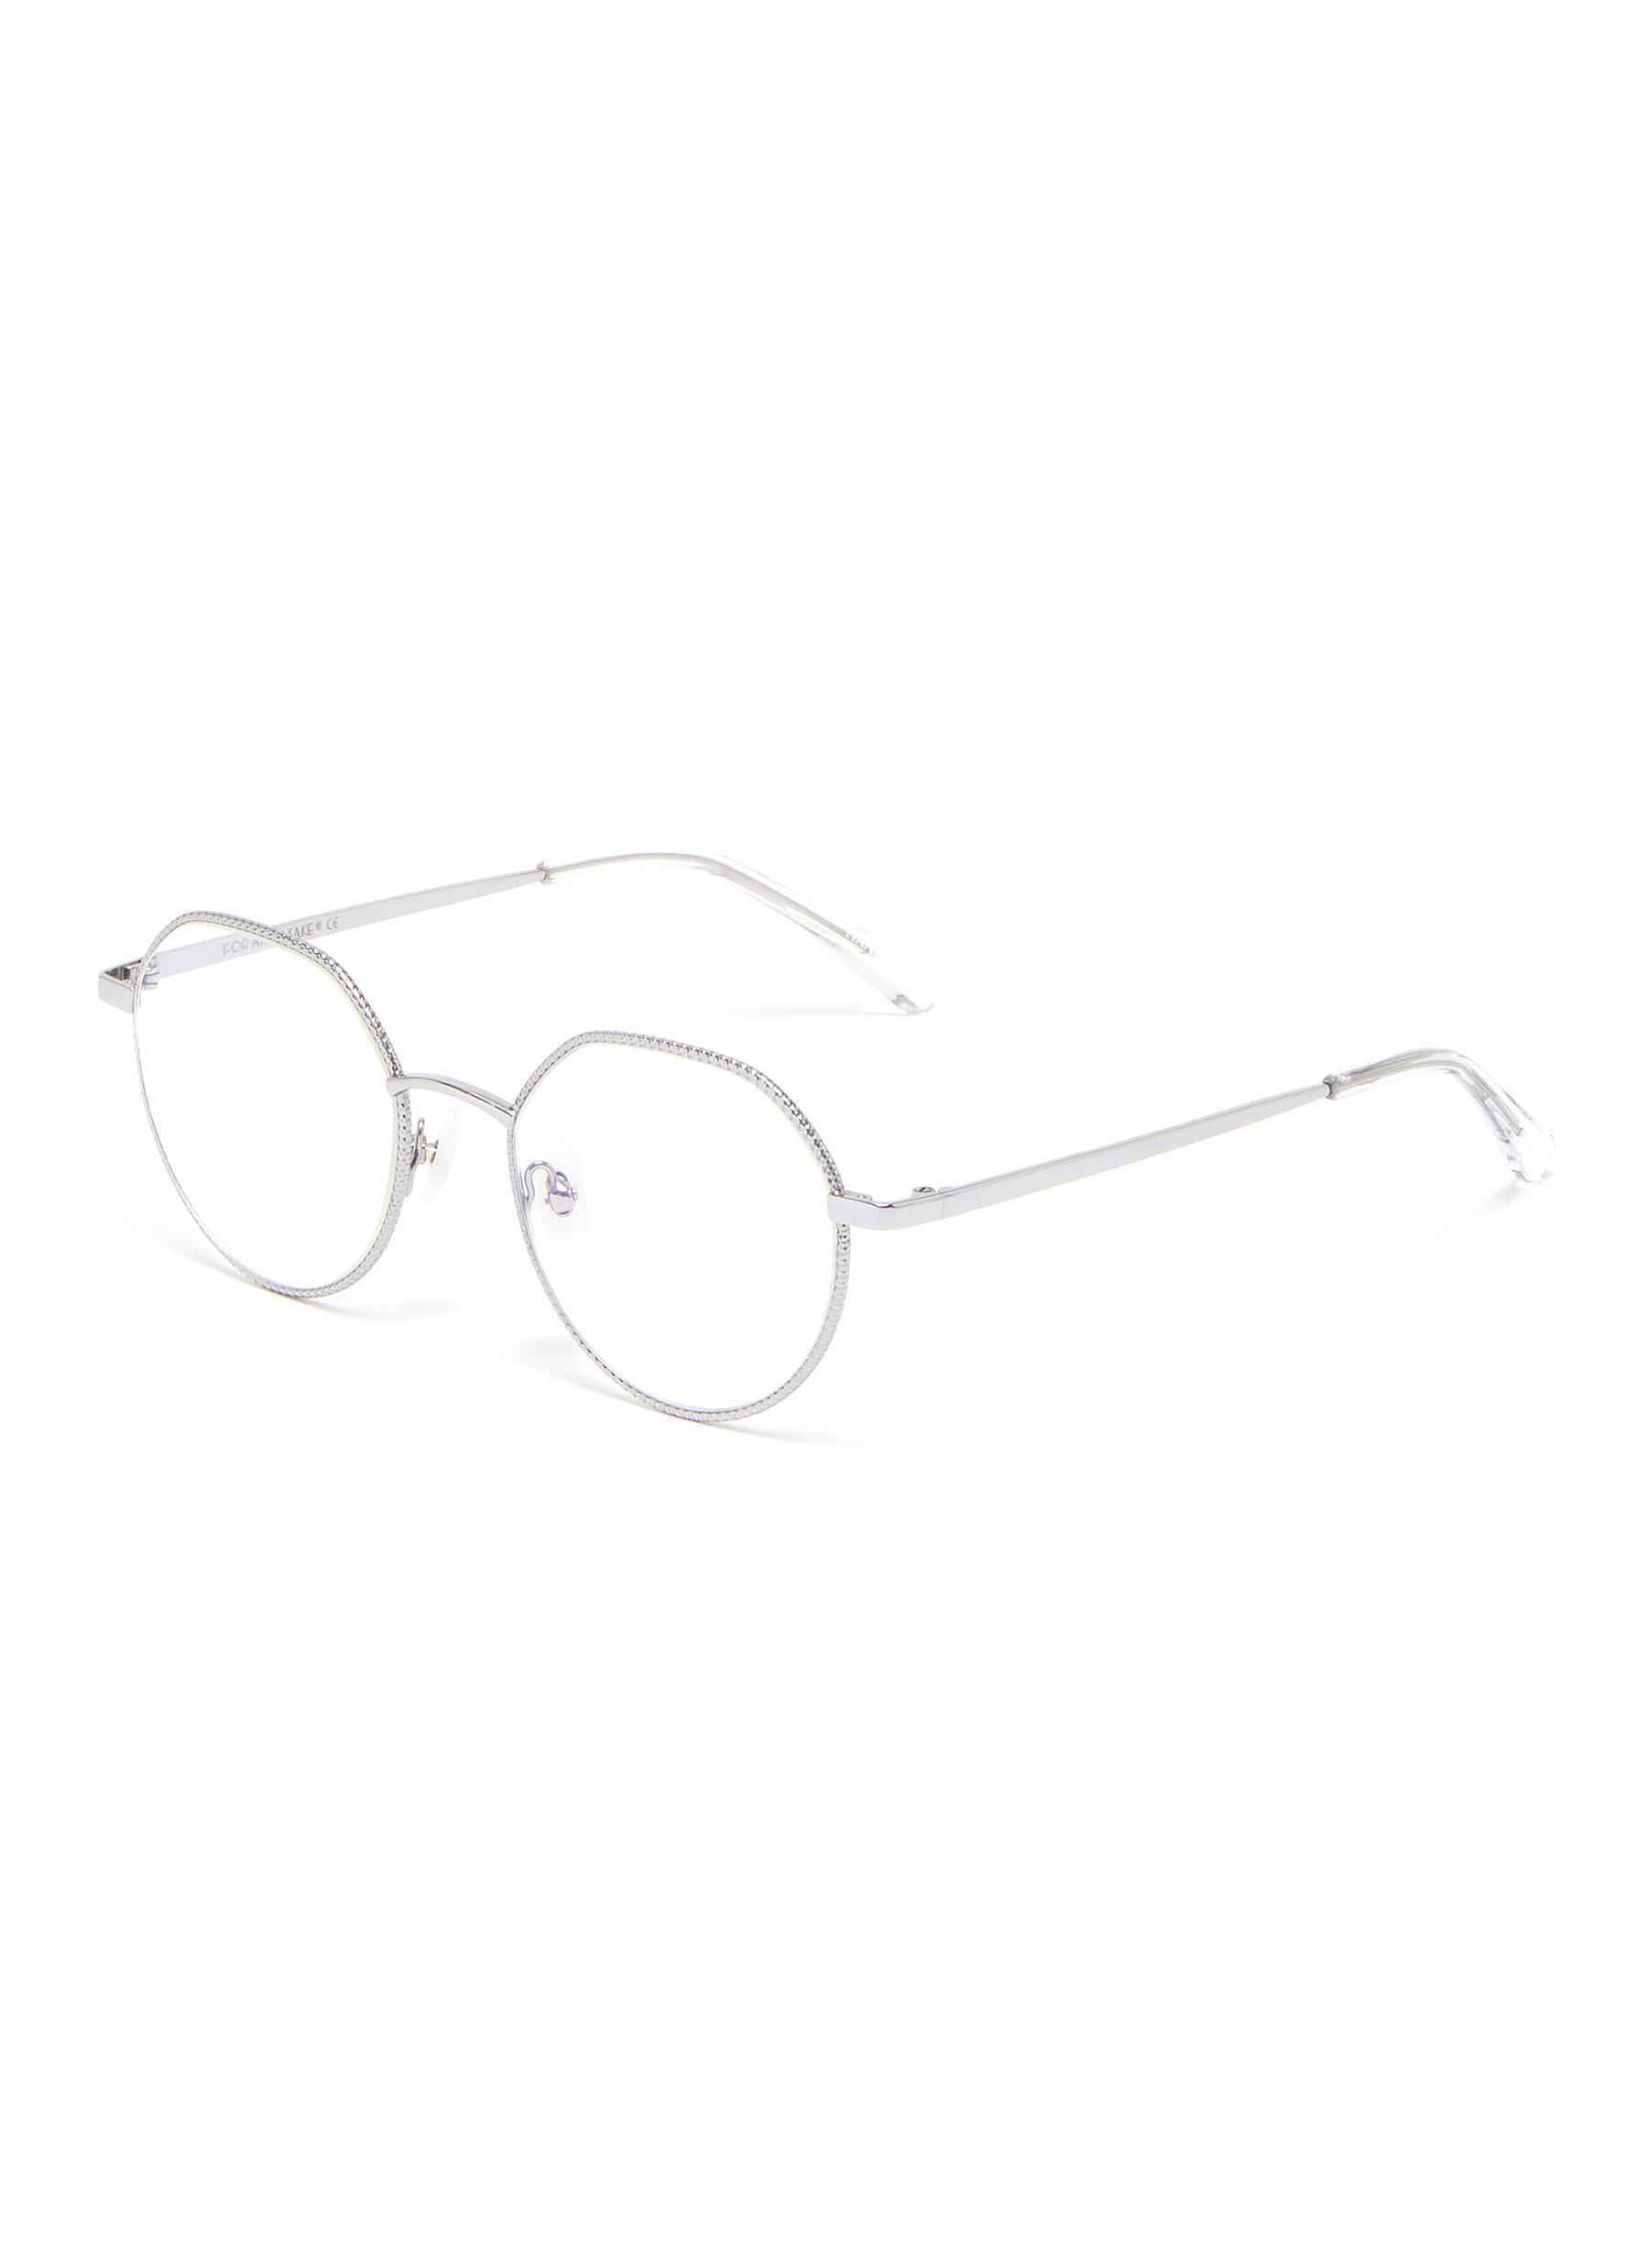 Hope' Diamond-cut Rim Palladium Plated Optical Glasses